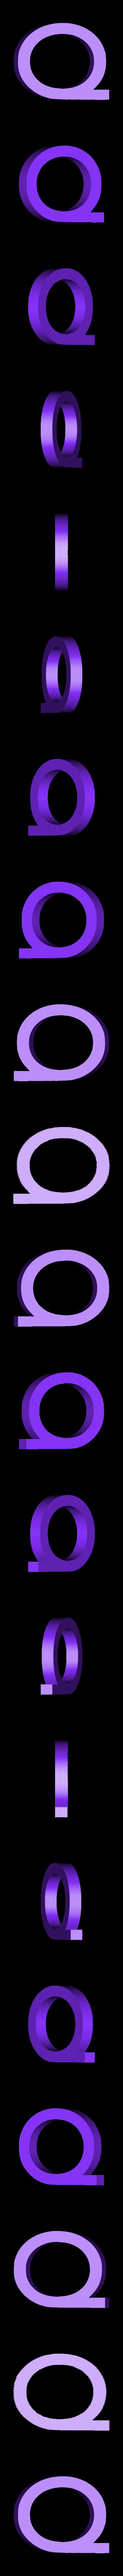 q.stl Download STL file QNET LOGO • Design to 3D print, alono